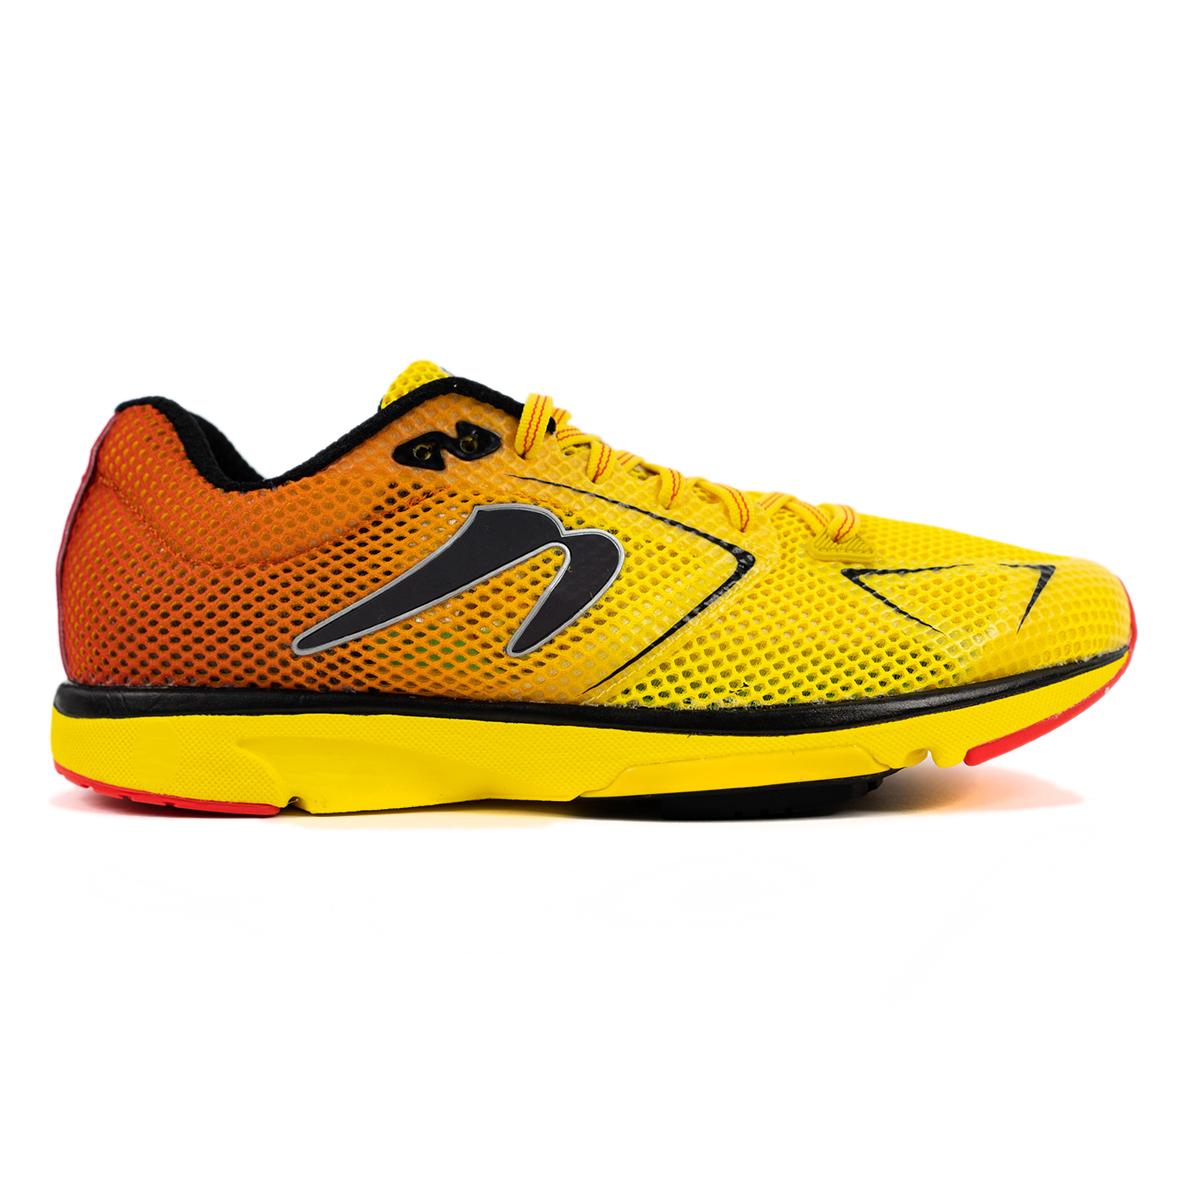 Men's Newton Distance 9 Running Shoe - Color: Sunfire/Black (Regular Width) - Size: 6, Sunfire/Black, large, image 1